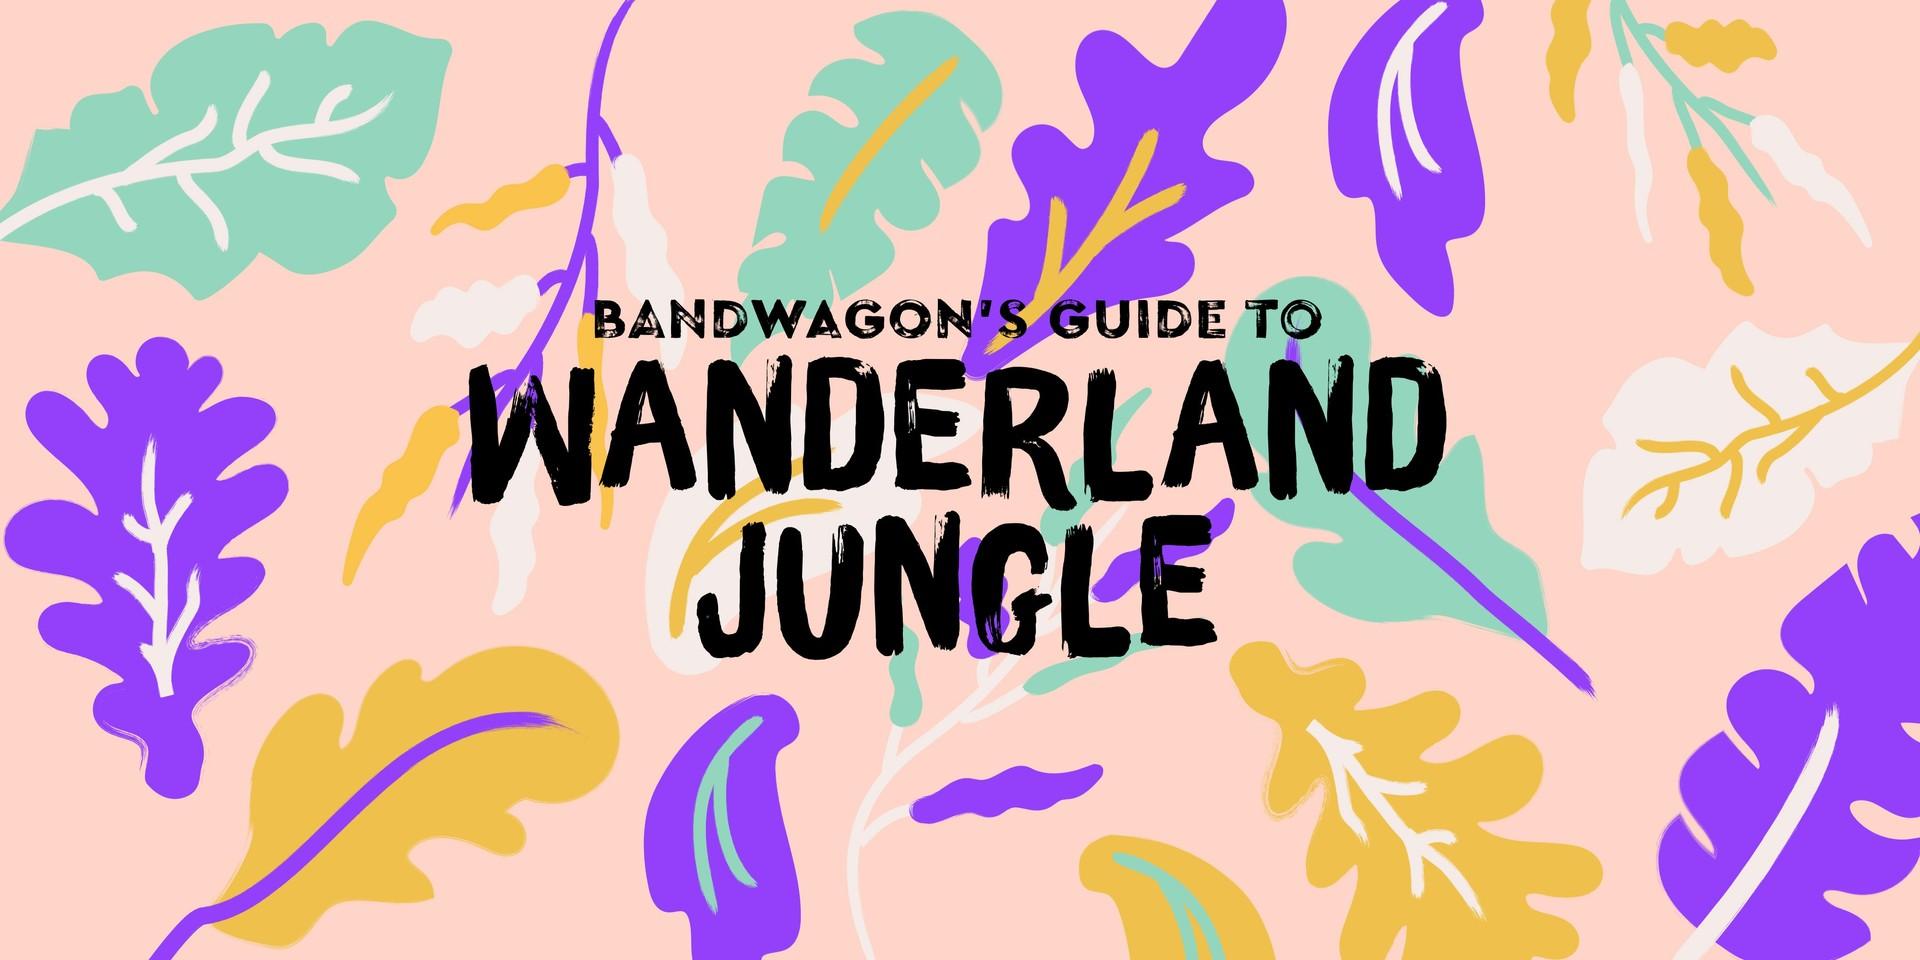 Bandwagon's Guide to Wanderland Jungle